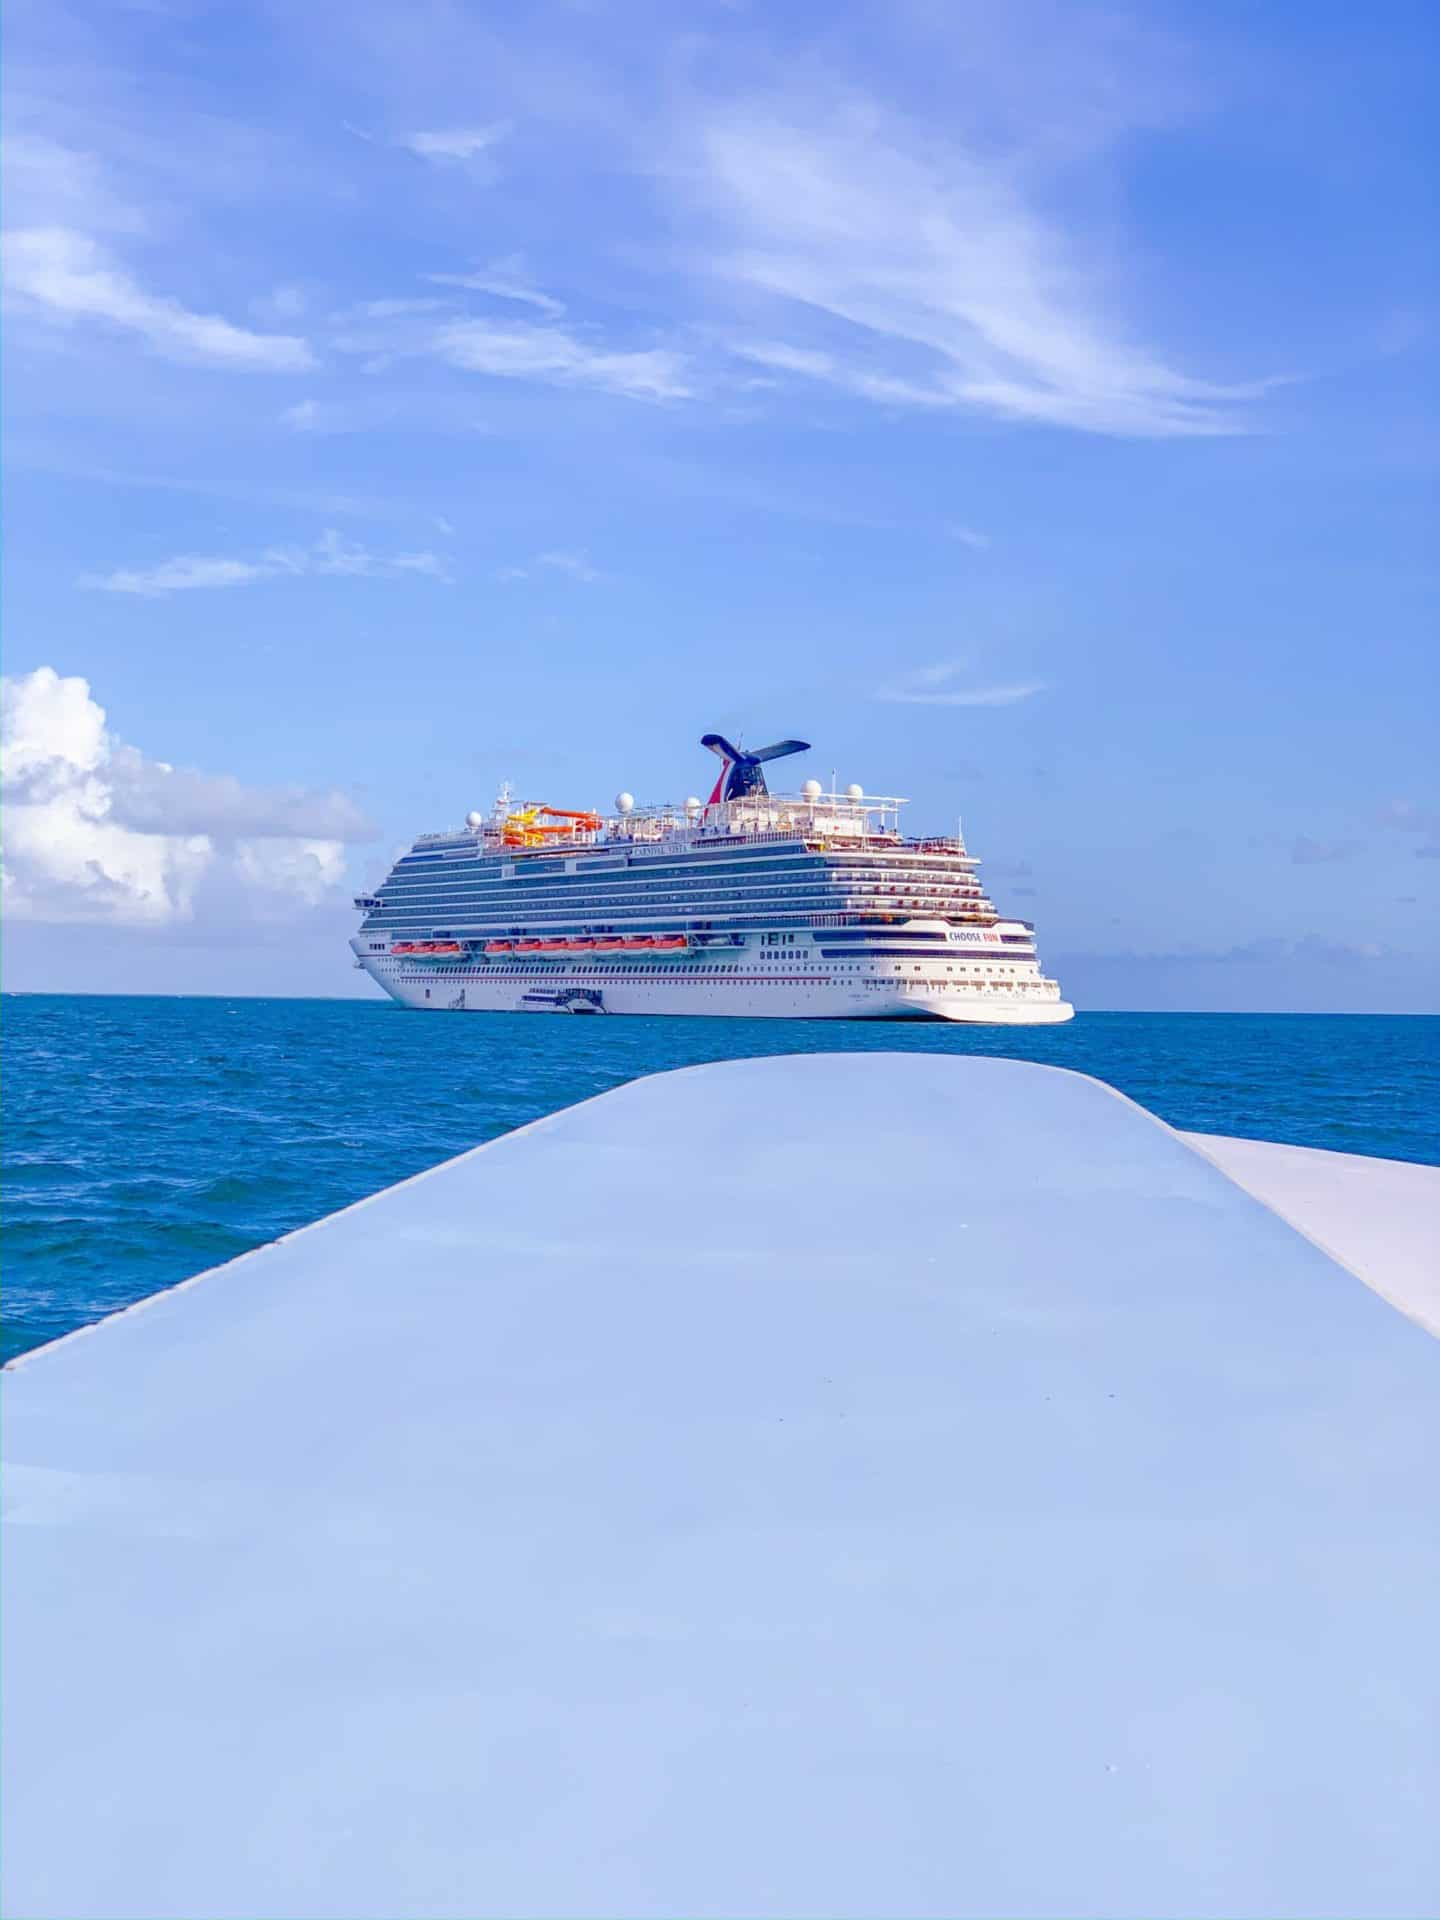 Carnival Vista Western Caribbean Cruise - Belize | Shaunda Necole